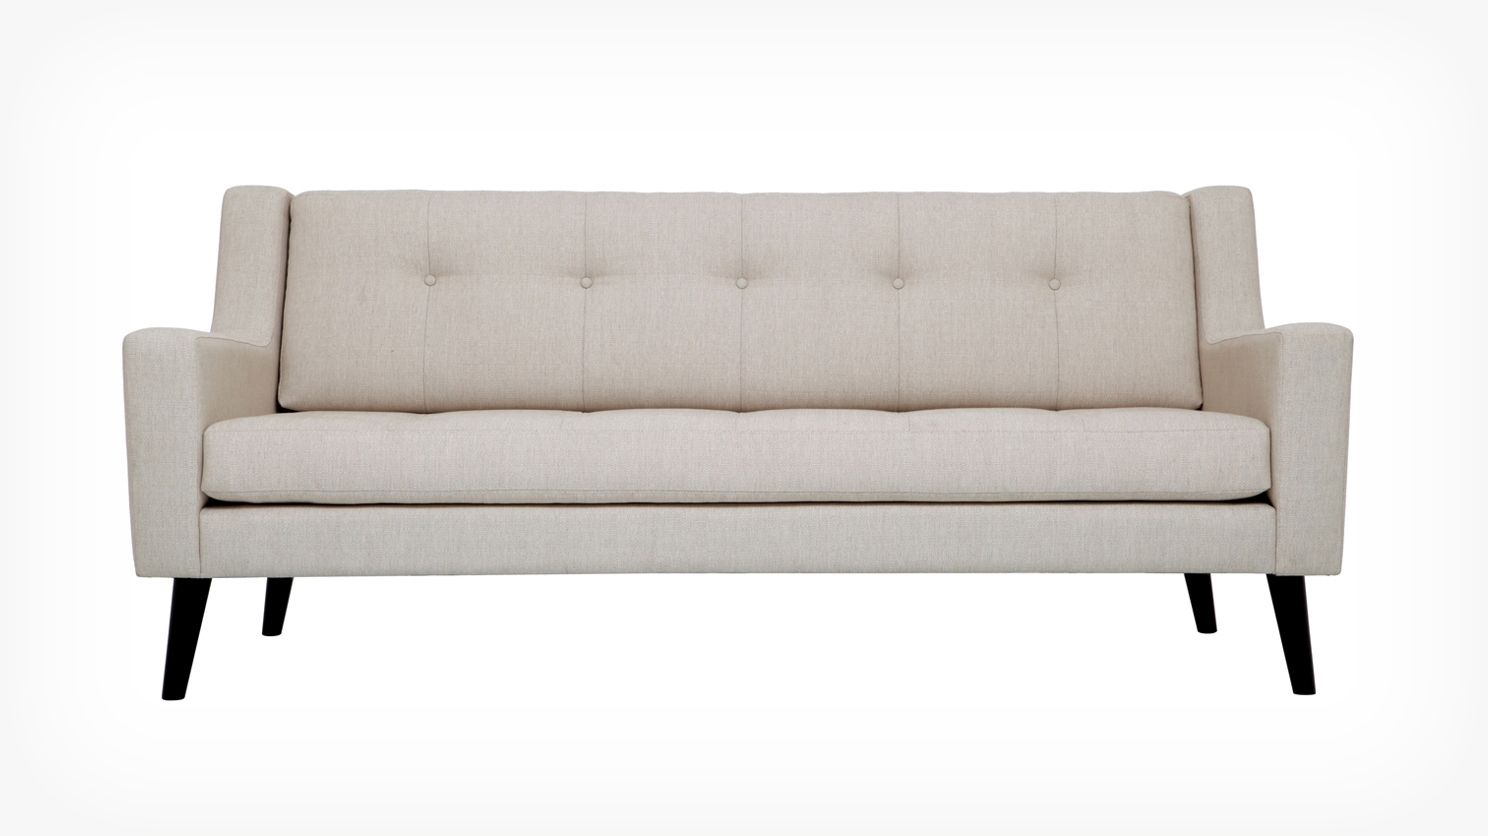 modern sofa bed new york best living room sofas elise fabric eq3 furniture 1399